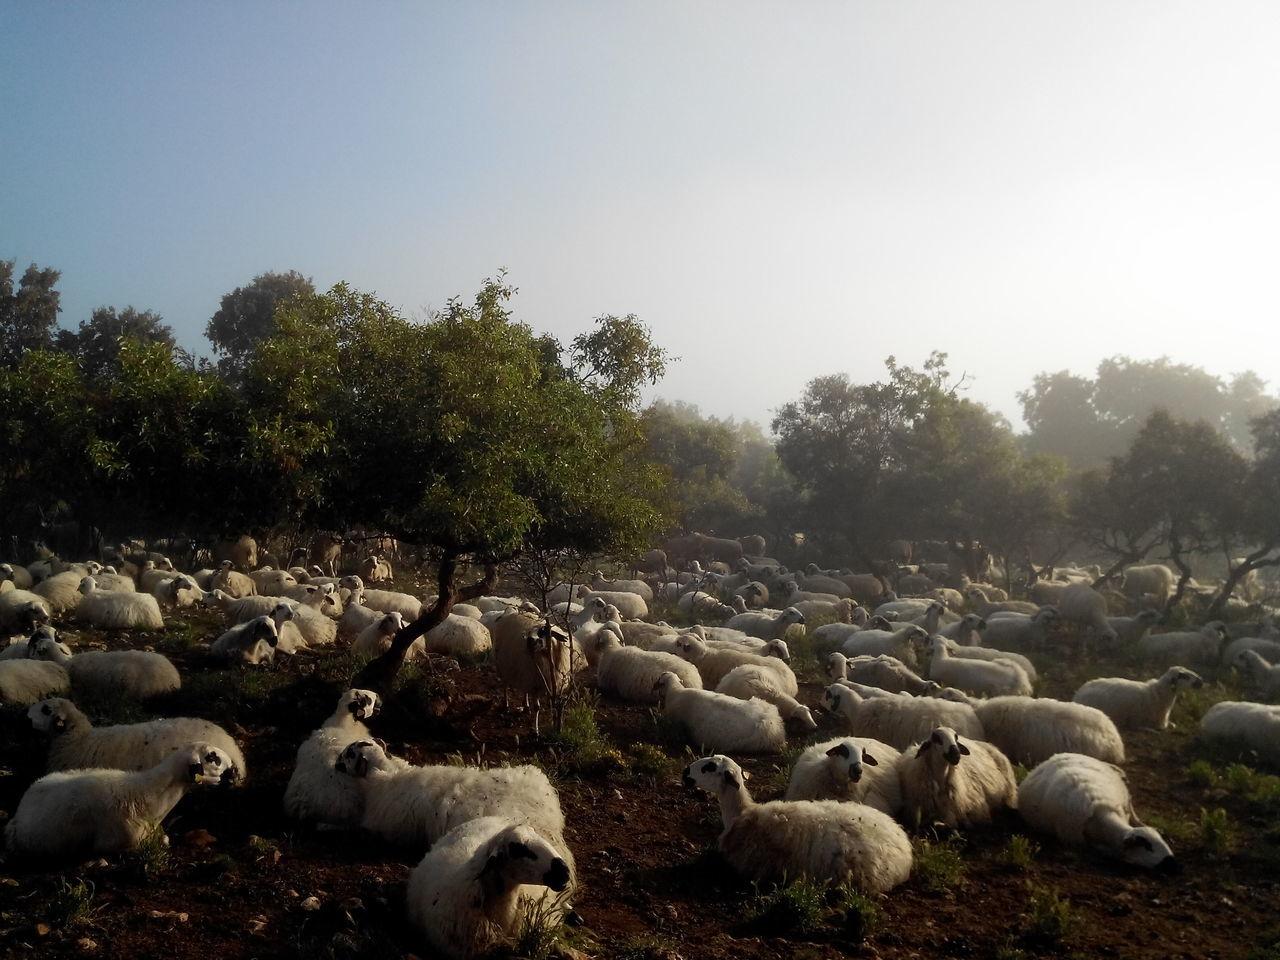 Camino CaminodeSantiago El Camino De Santiago Jakobsweg Morgen Morning Pilgern Pilgrimage Schafe Sheeps Sommer Summer Way Of Saint James